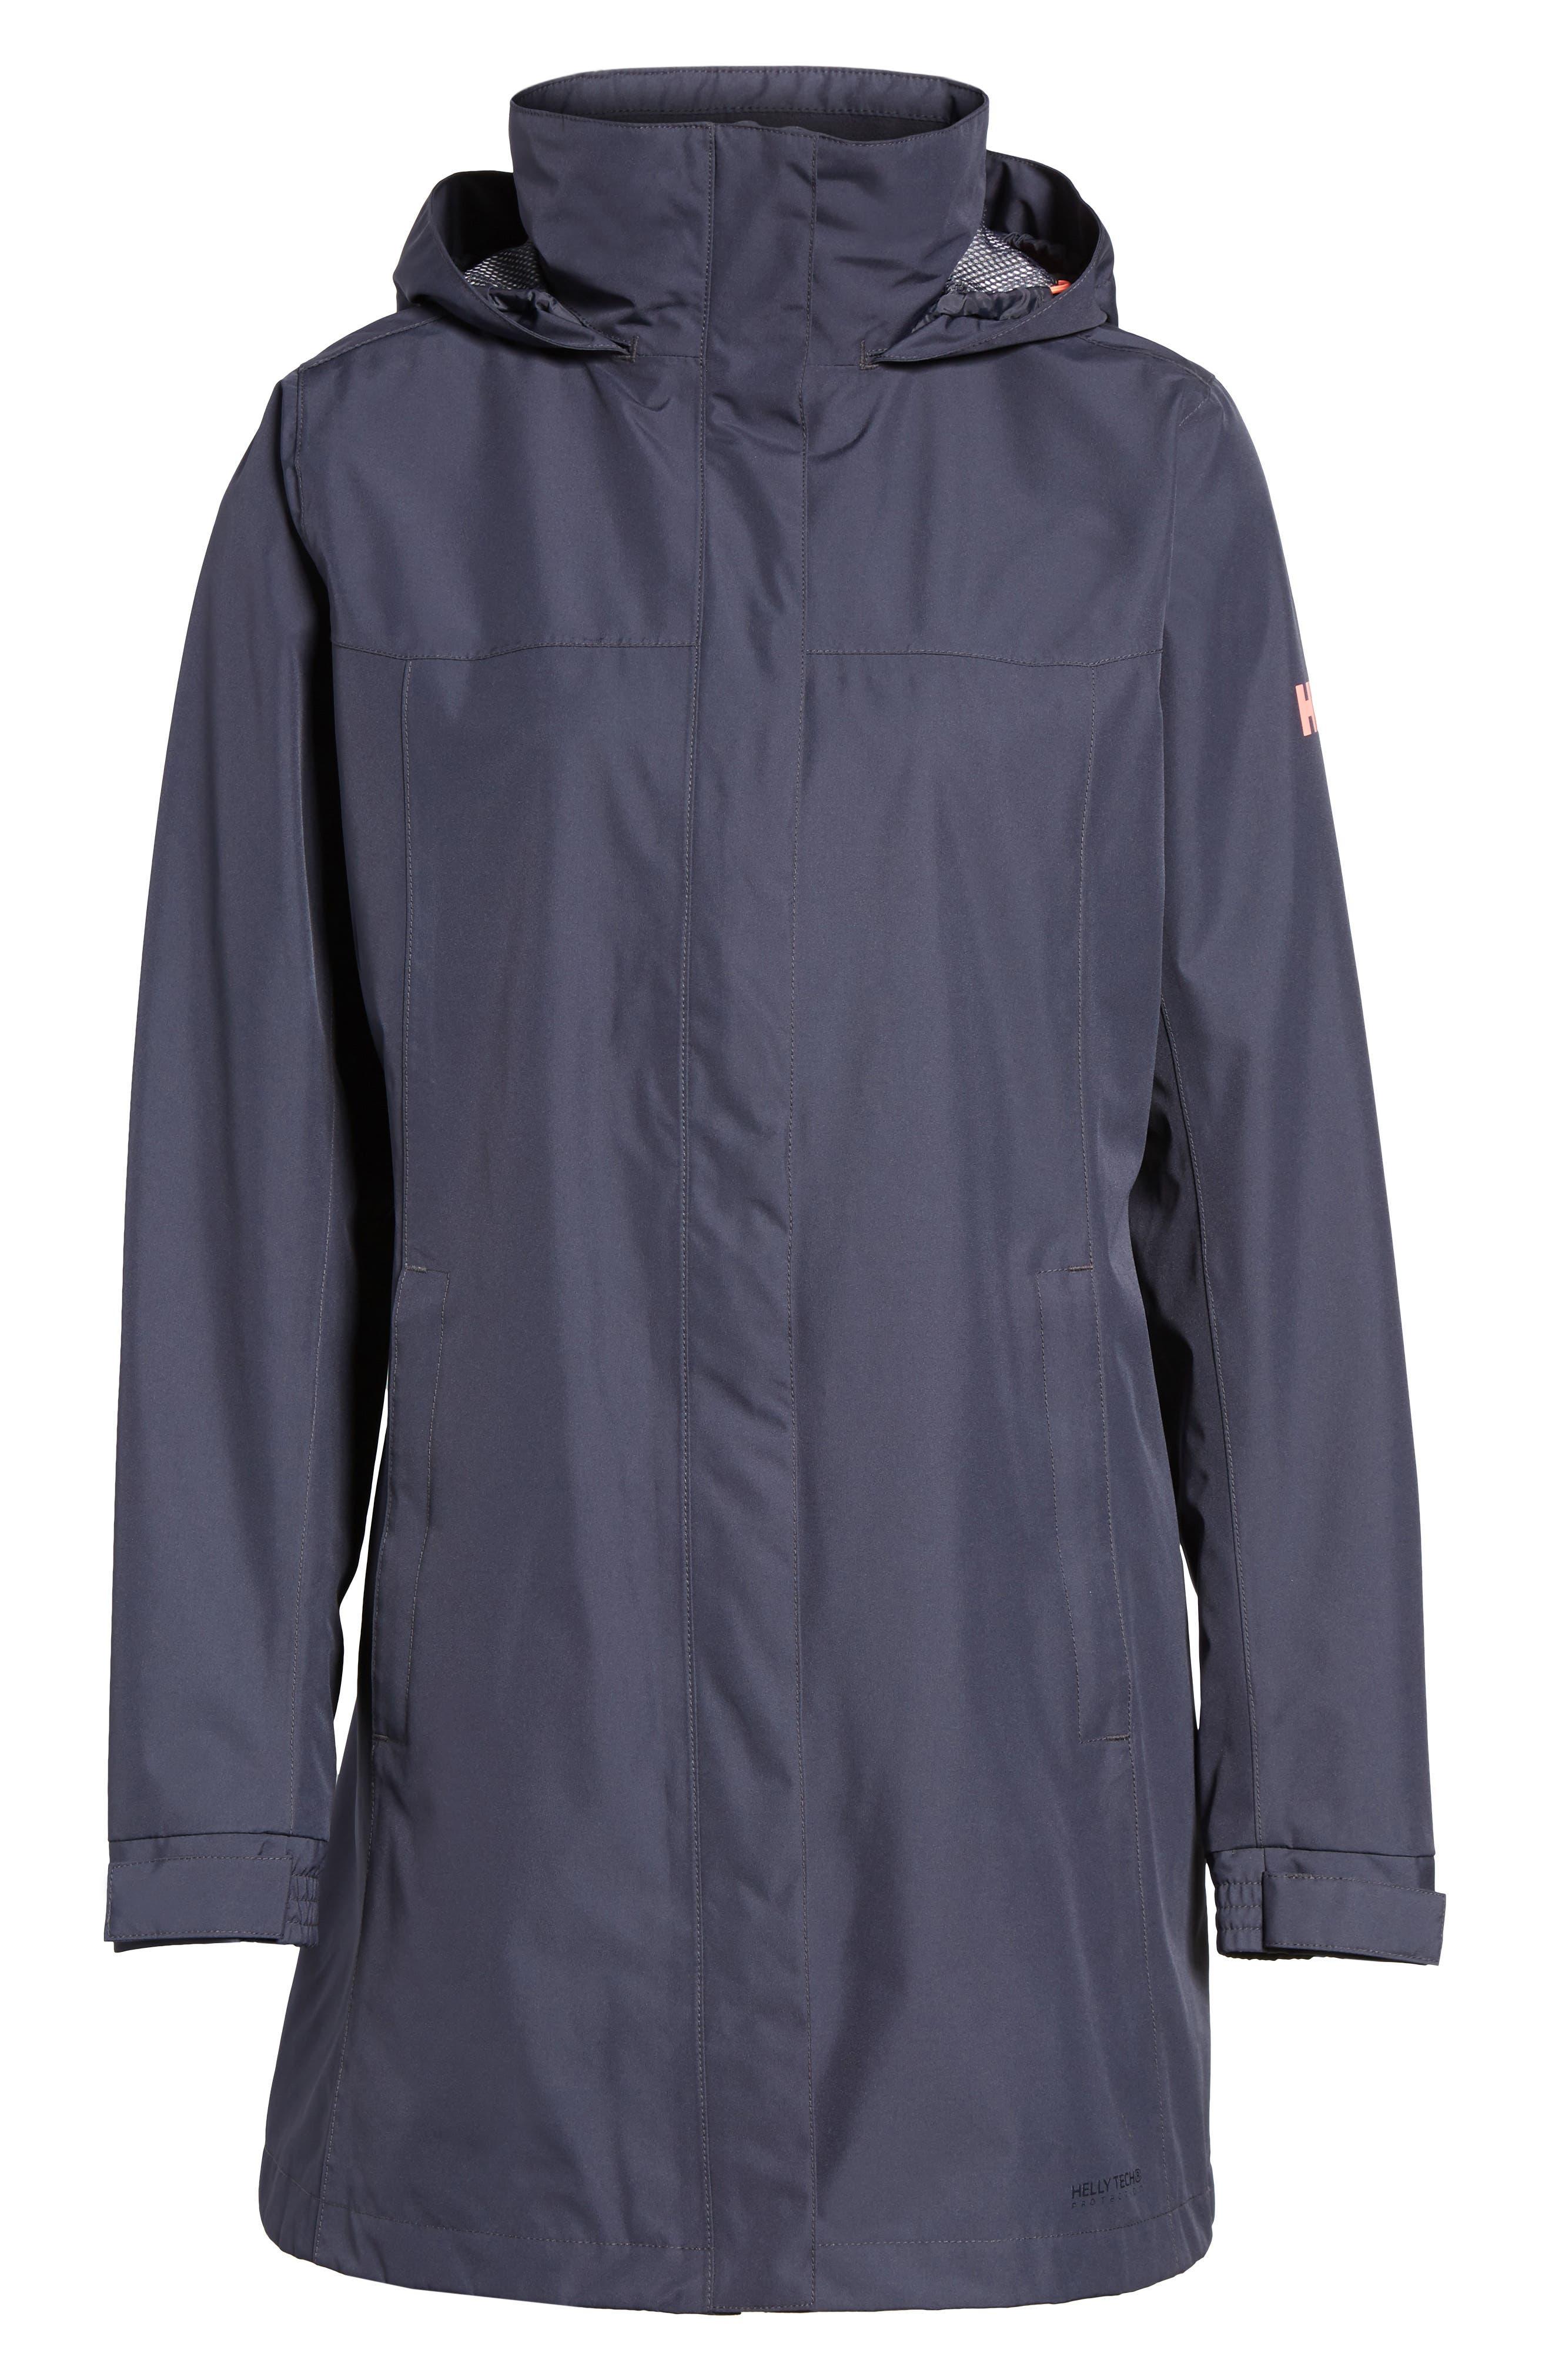 'Aden' Helly Tech<sup>®</sup> Raincoat,                             Alternate thumbnail 7, color,                             Graphite Blue